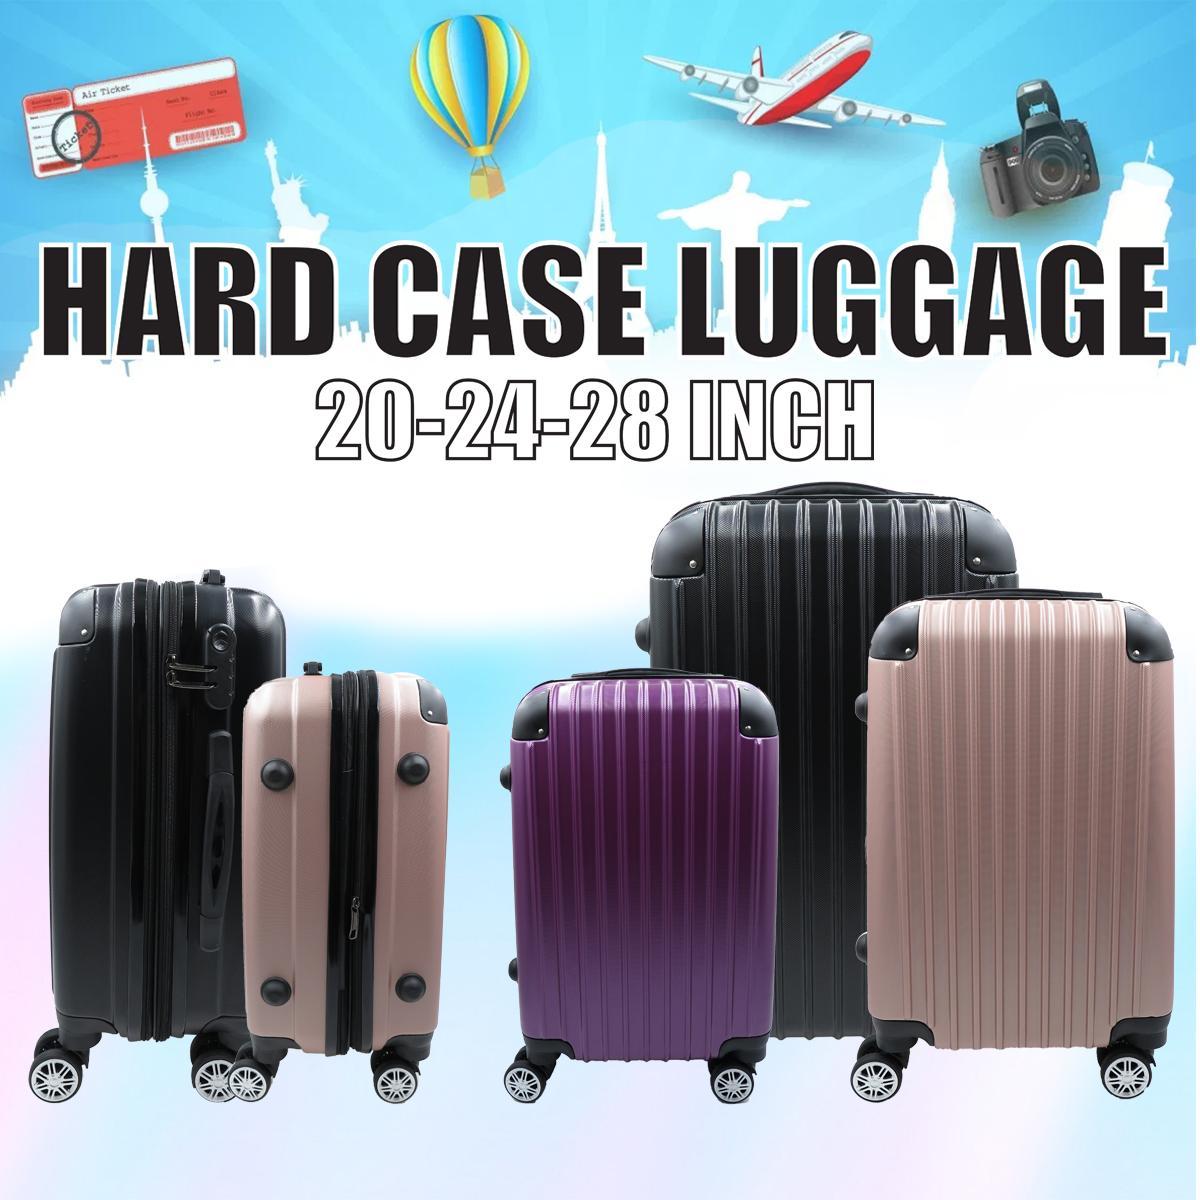 Hard Case Luggage 20-24-28 Inch (l400) By Moda Paolo.